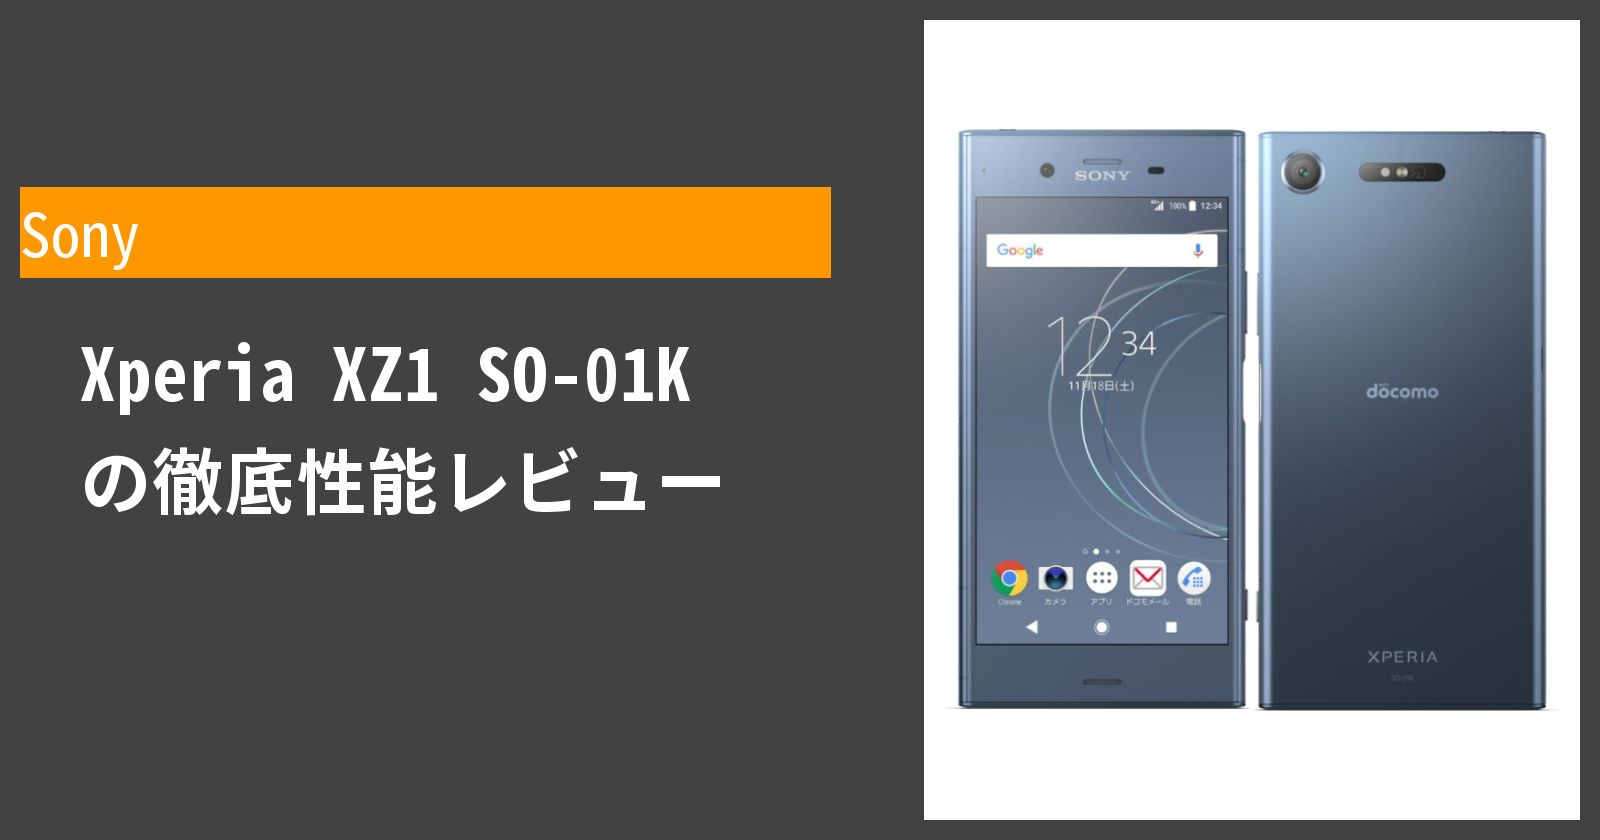 Xperia XZ1 SO-01K docomo の徹底性能レビュー